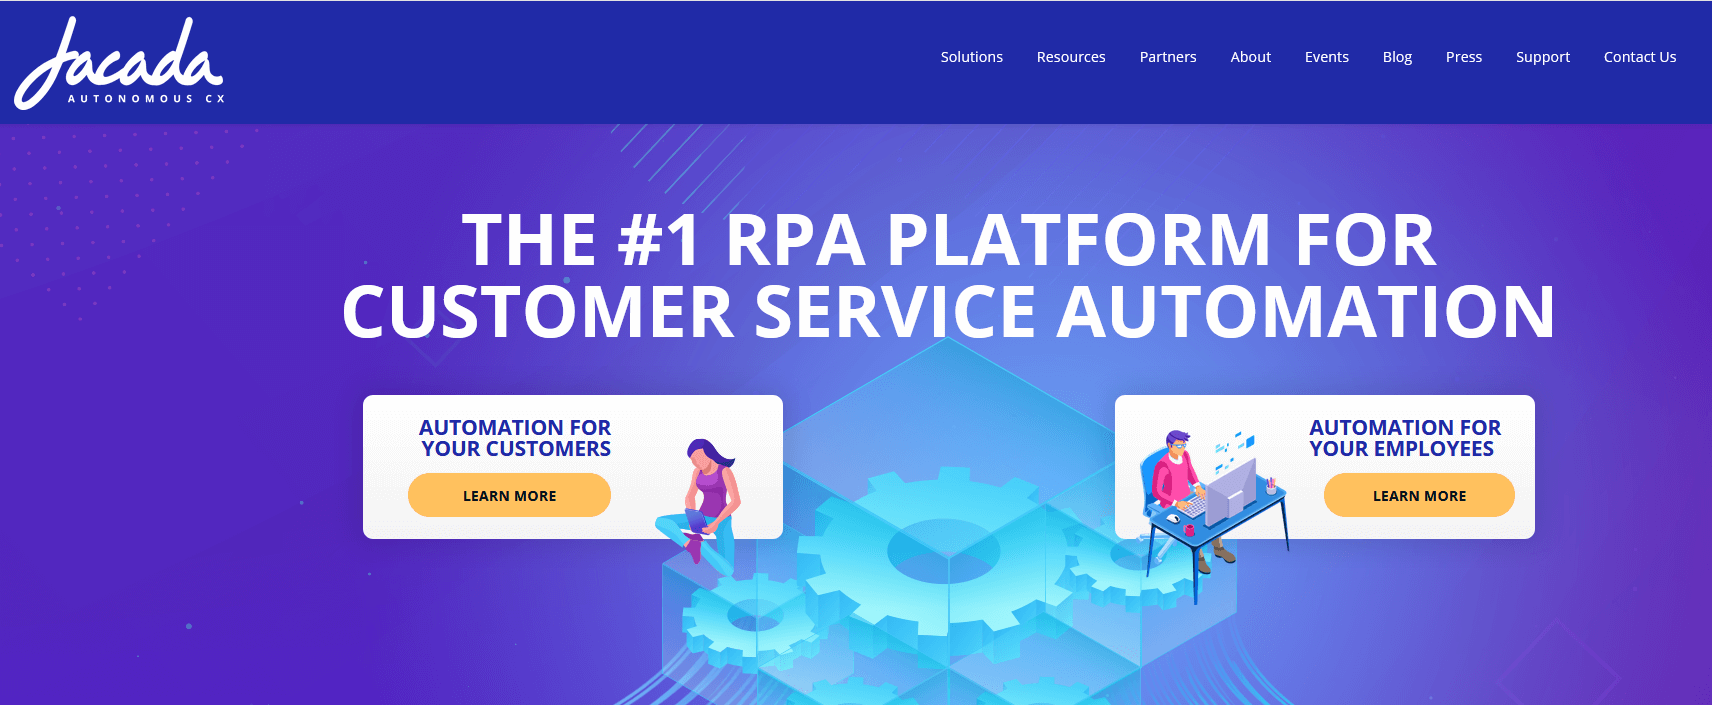 Jacada RPA Platform